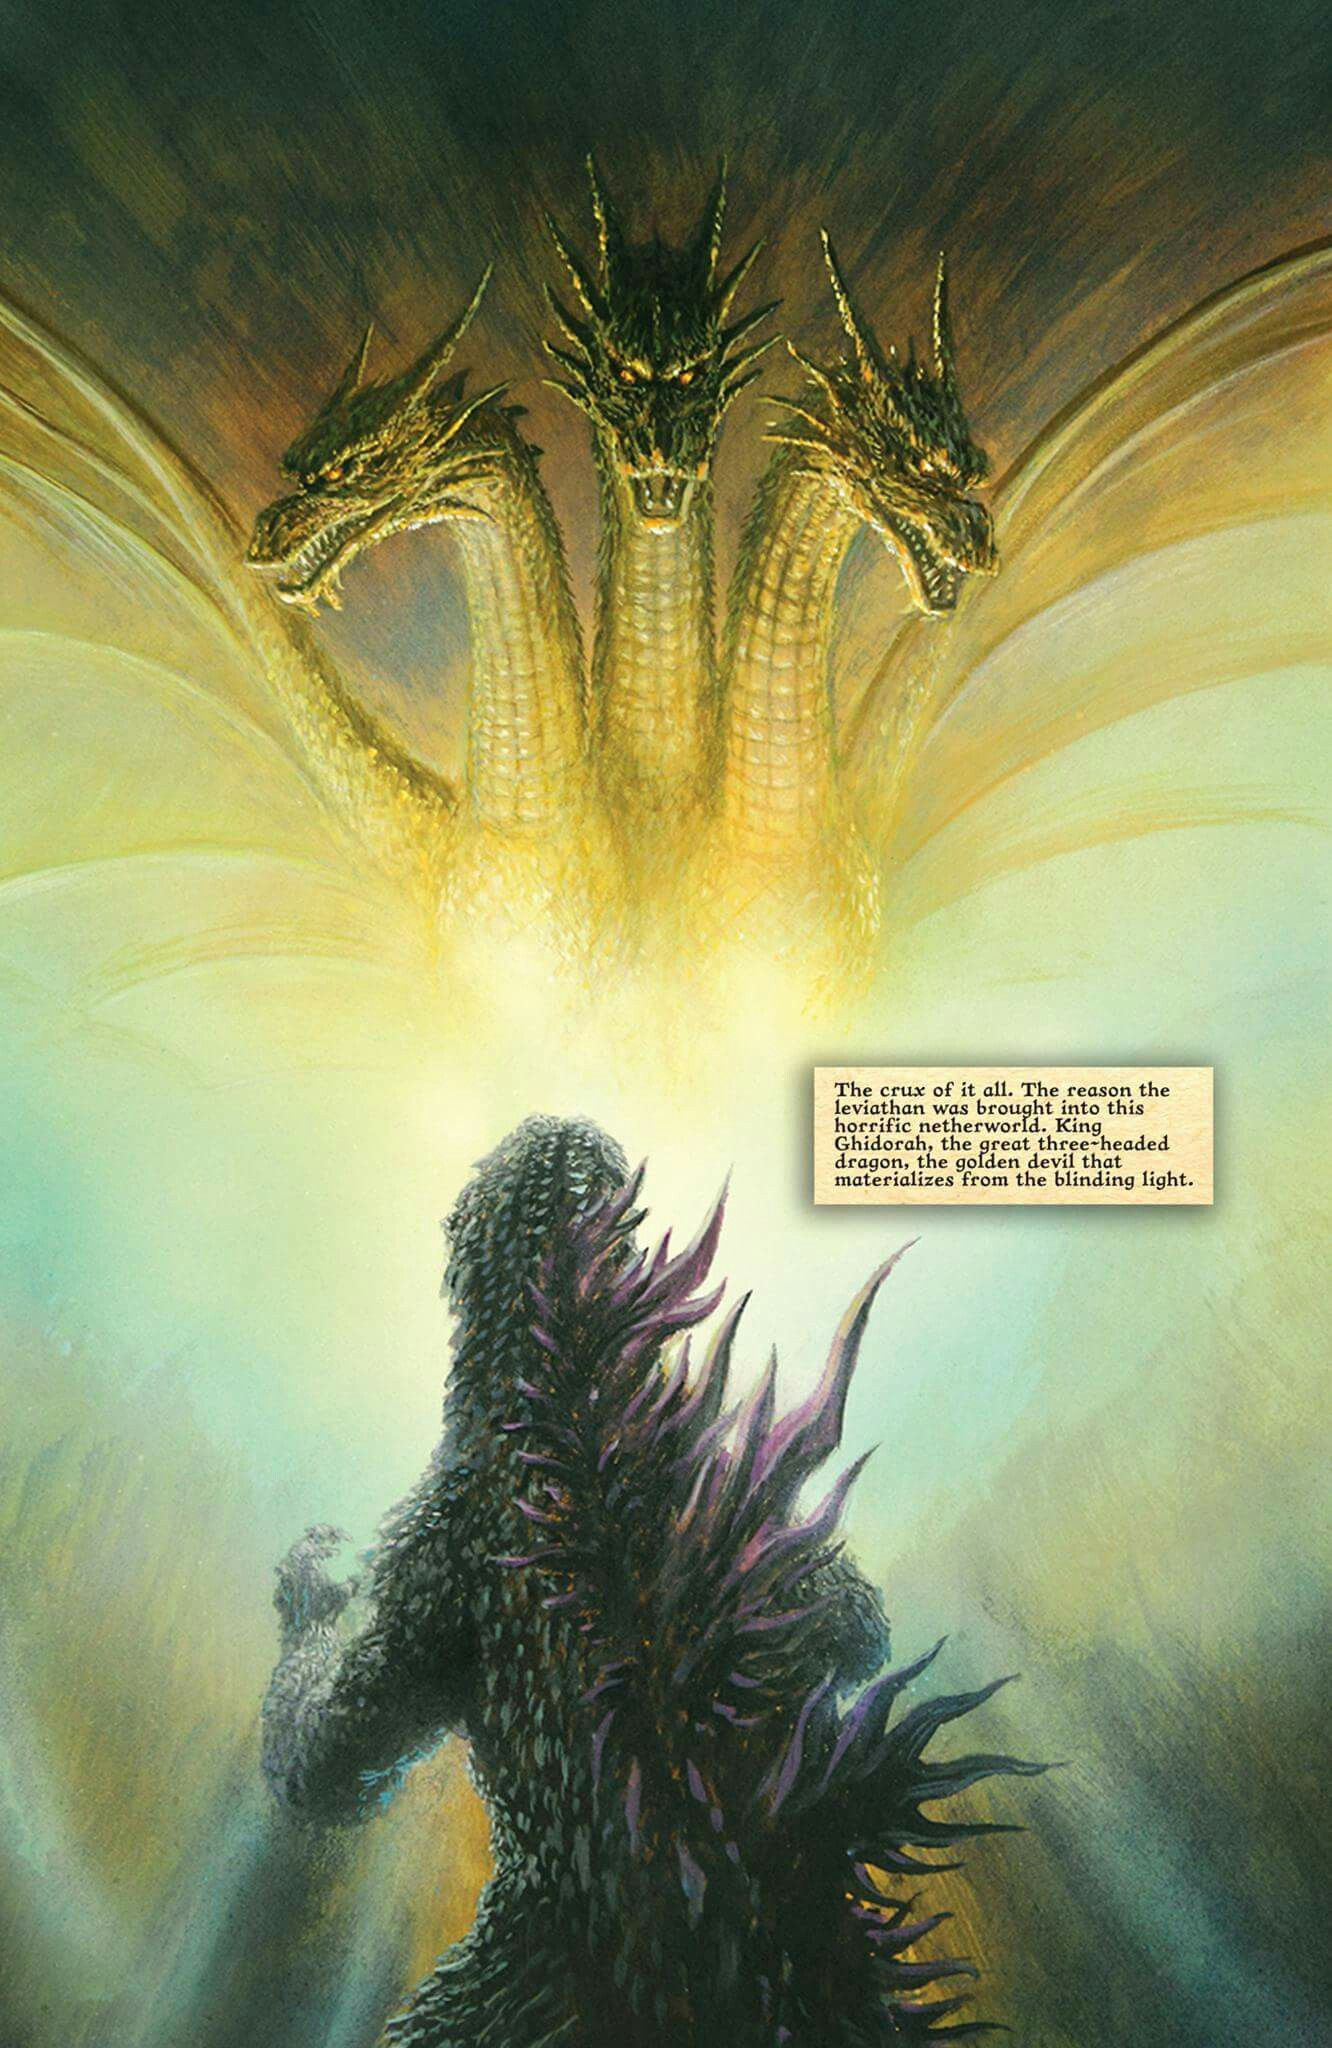 Badass Anime Girl Wallpaper Godzilla Vs King Ghidorah Godzilla Godzilla Godzilla